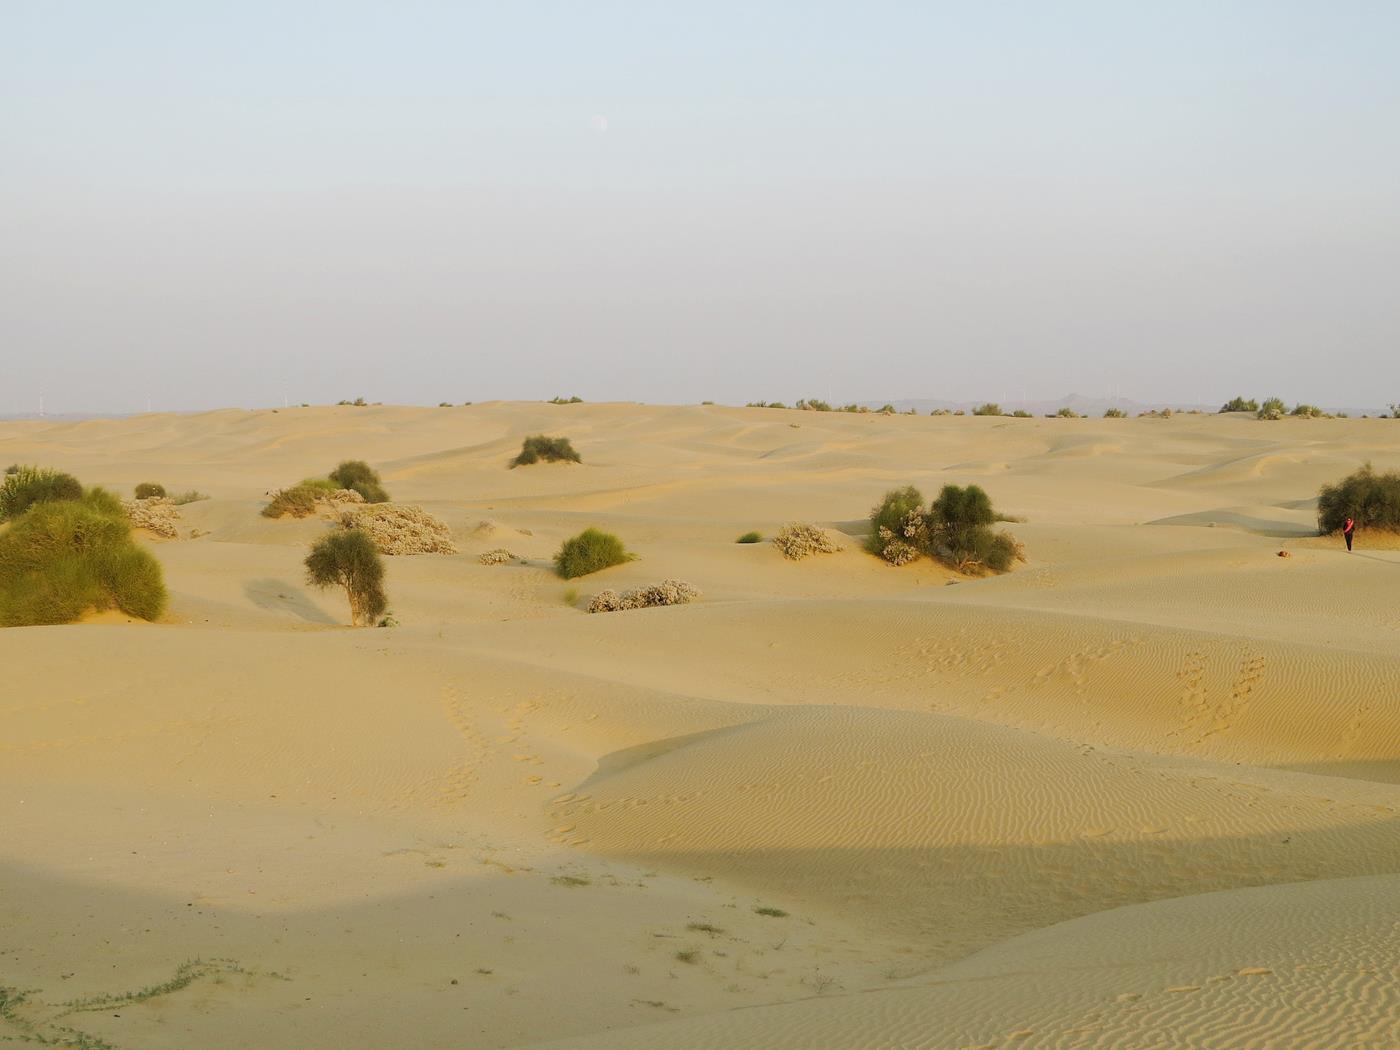 Kamelsafari, Jaisalmer